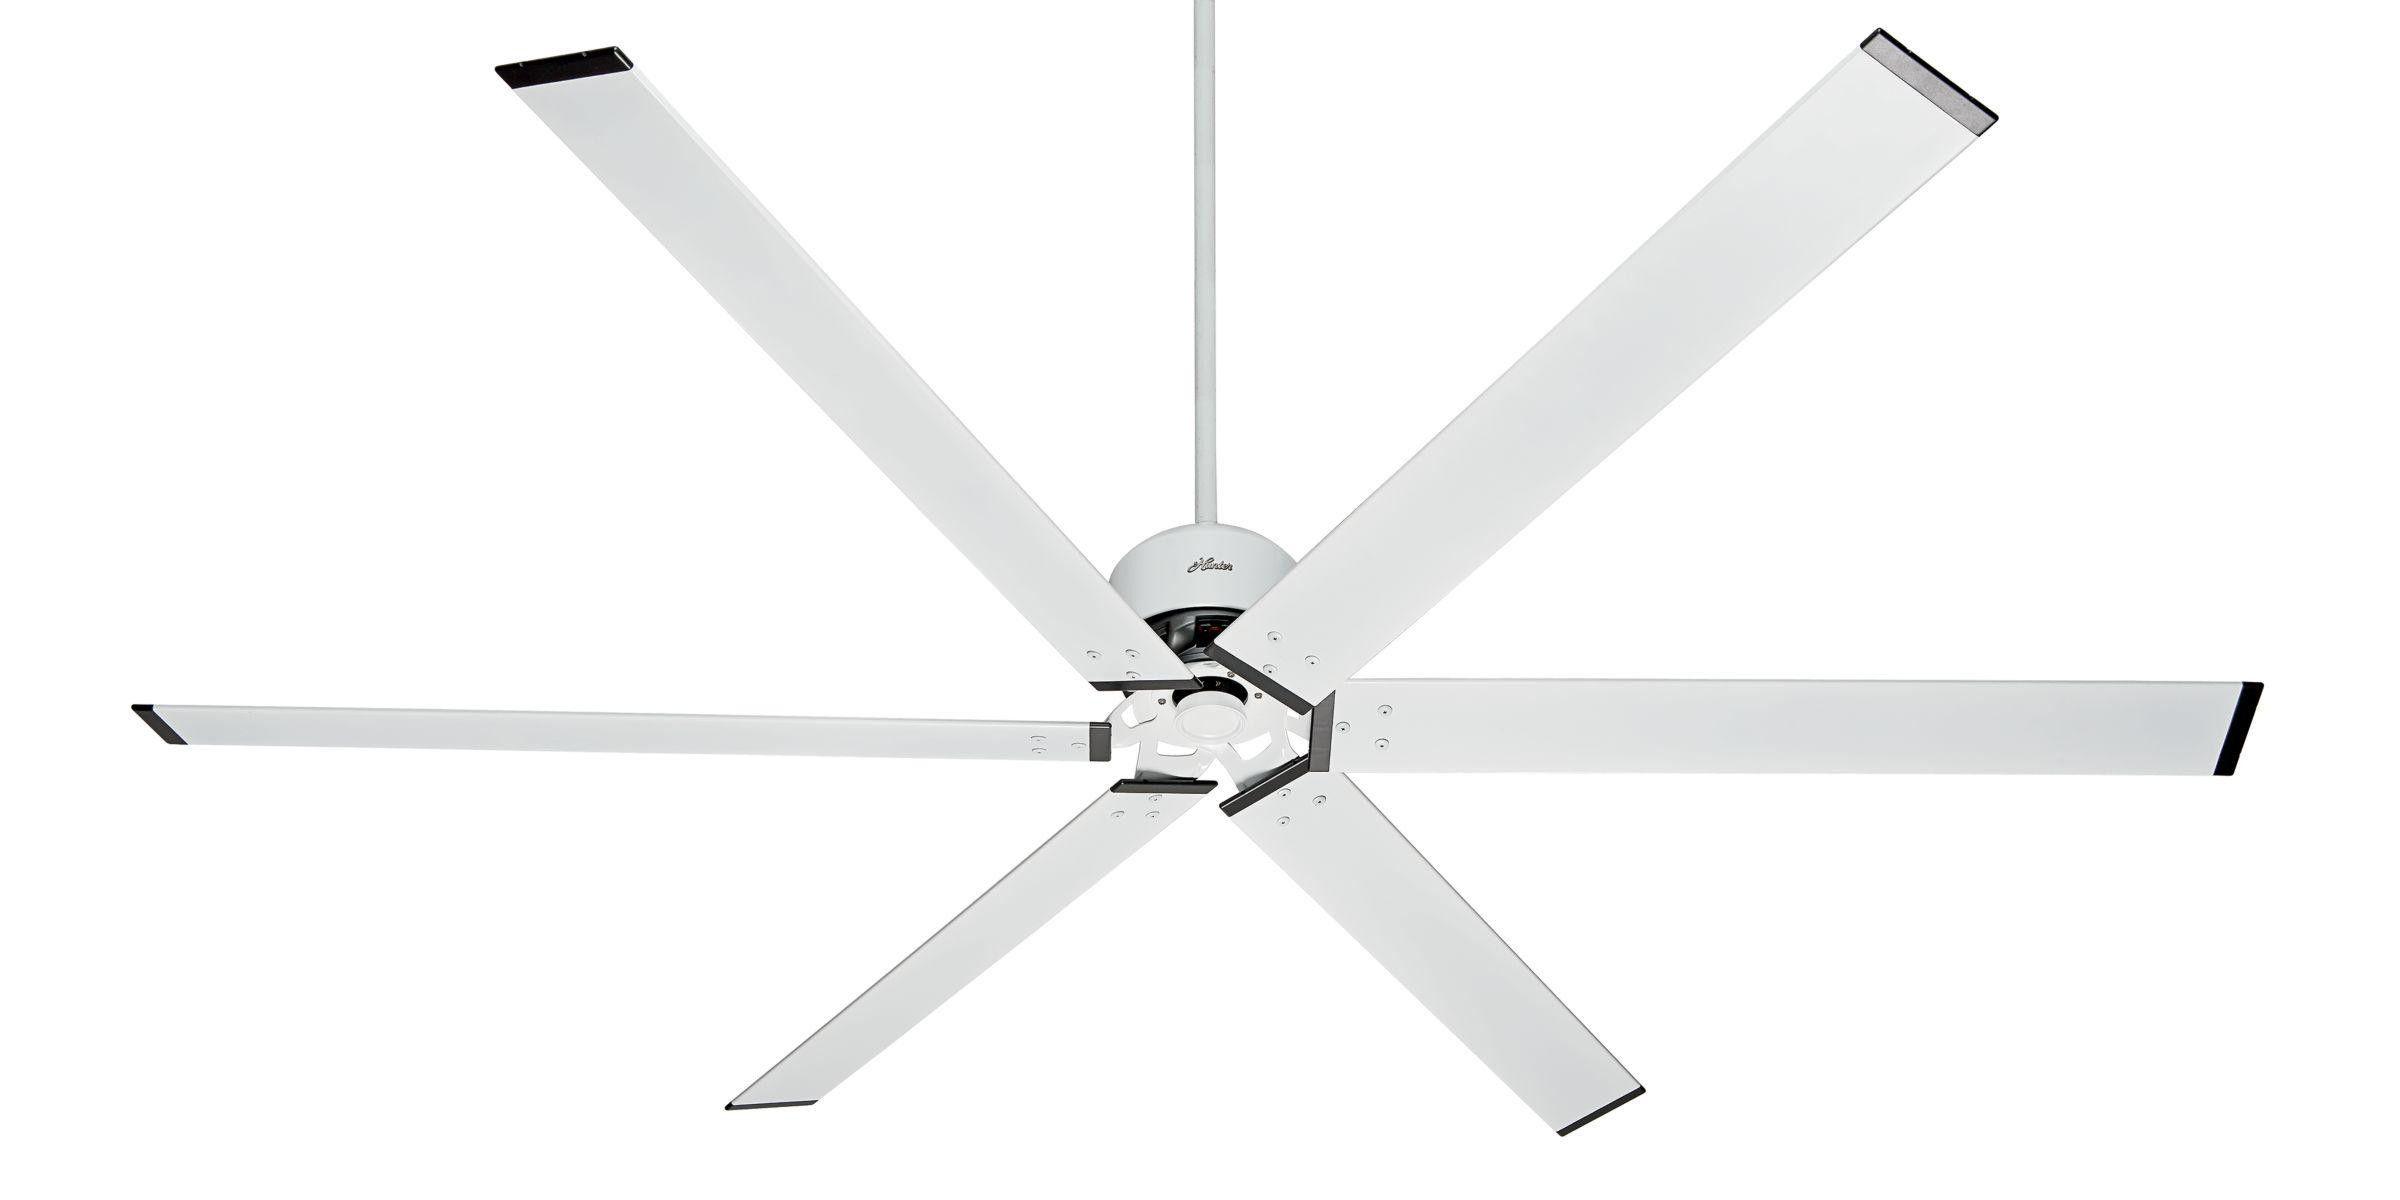 Design By Christophe Badarello For Menards Ceiling Fan Outdoor Ceiling Fans Quiet Ceiling Fans